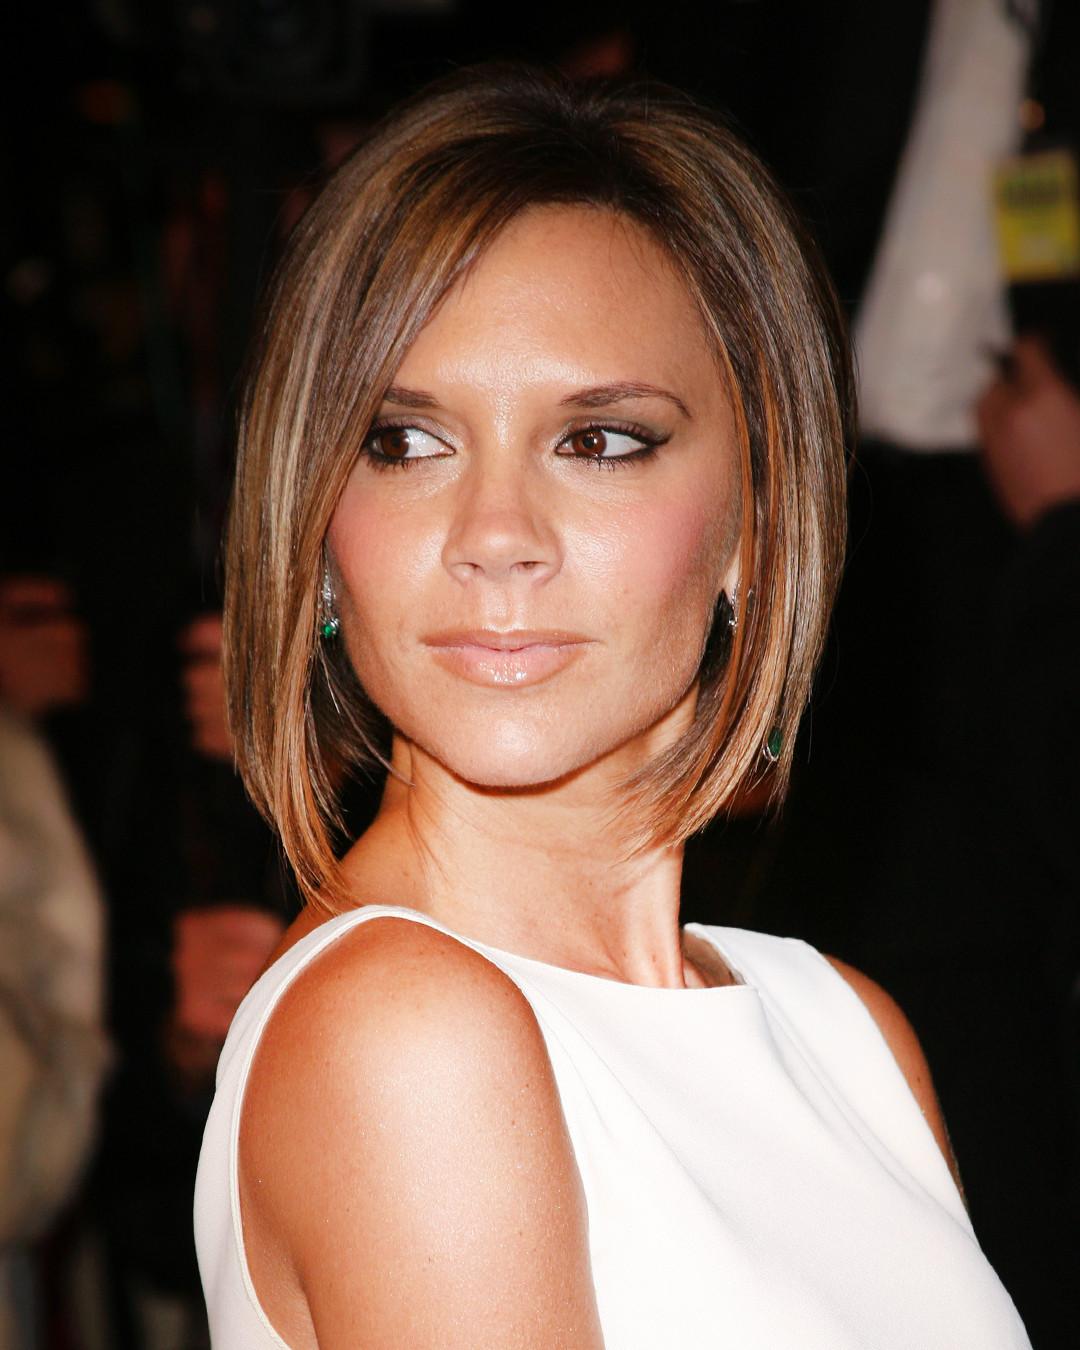 ESC: Victoria Beckham, Style Evolution, 2007